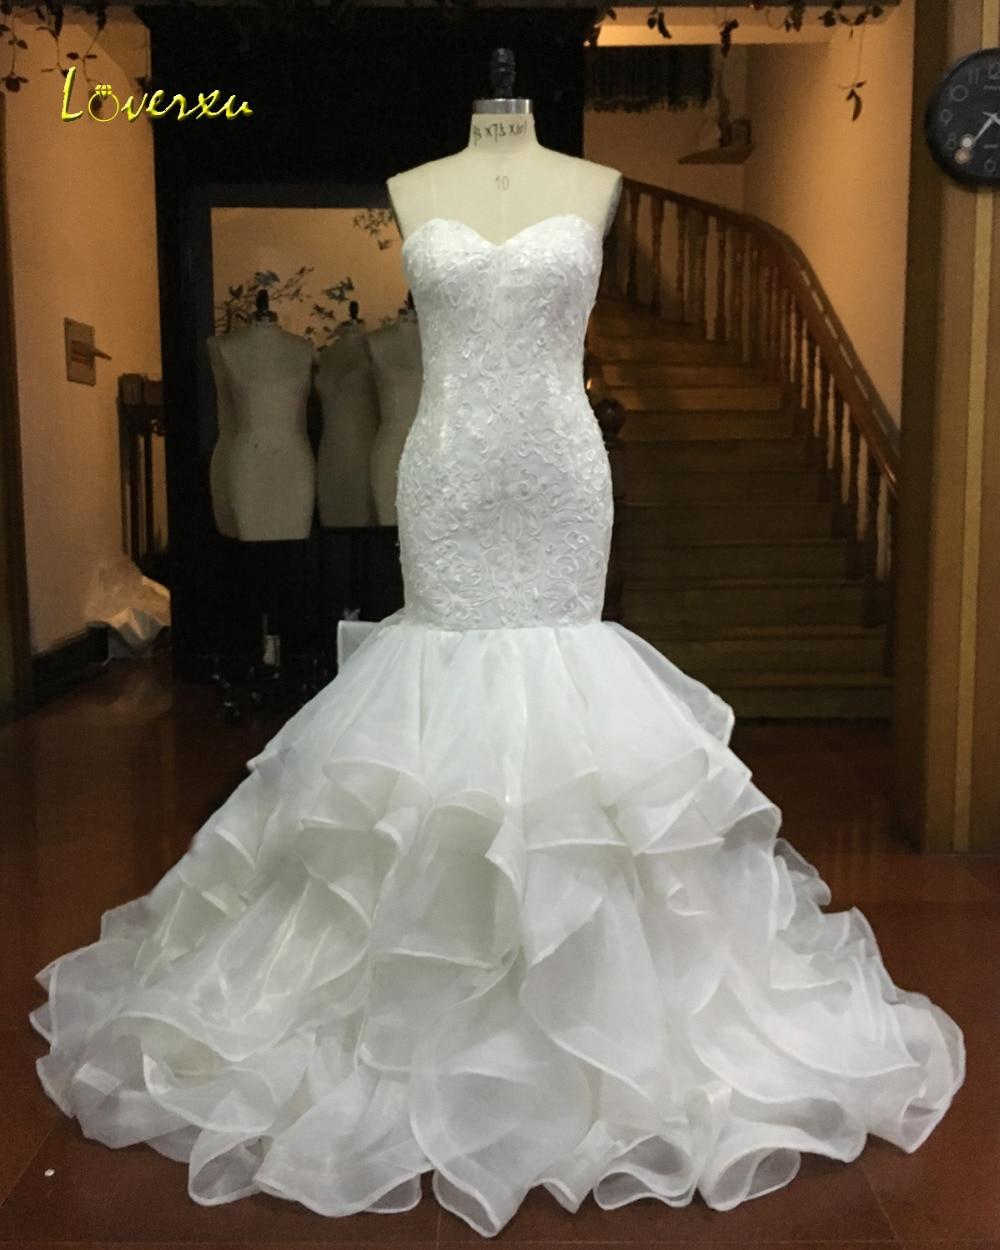 Loverxu Vestido De Noiva Strapless Ruffles Mermaid Wedding Dresses 2017 Sexy Backless Appliques China Bride Gown Plus Size